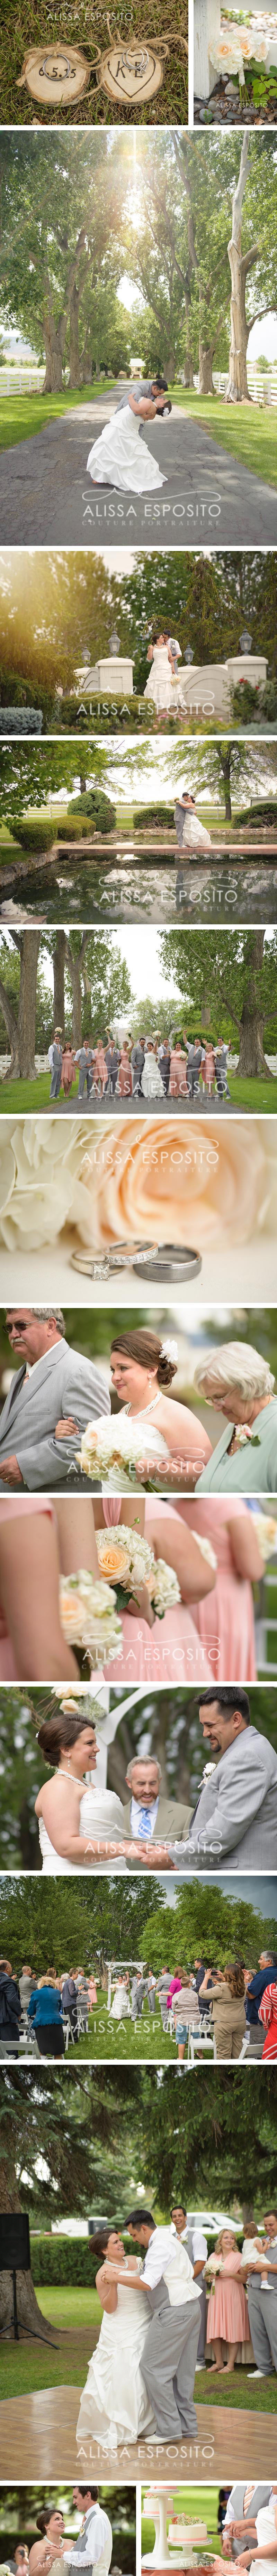 Alissa Esposito Photography Wedding